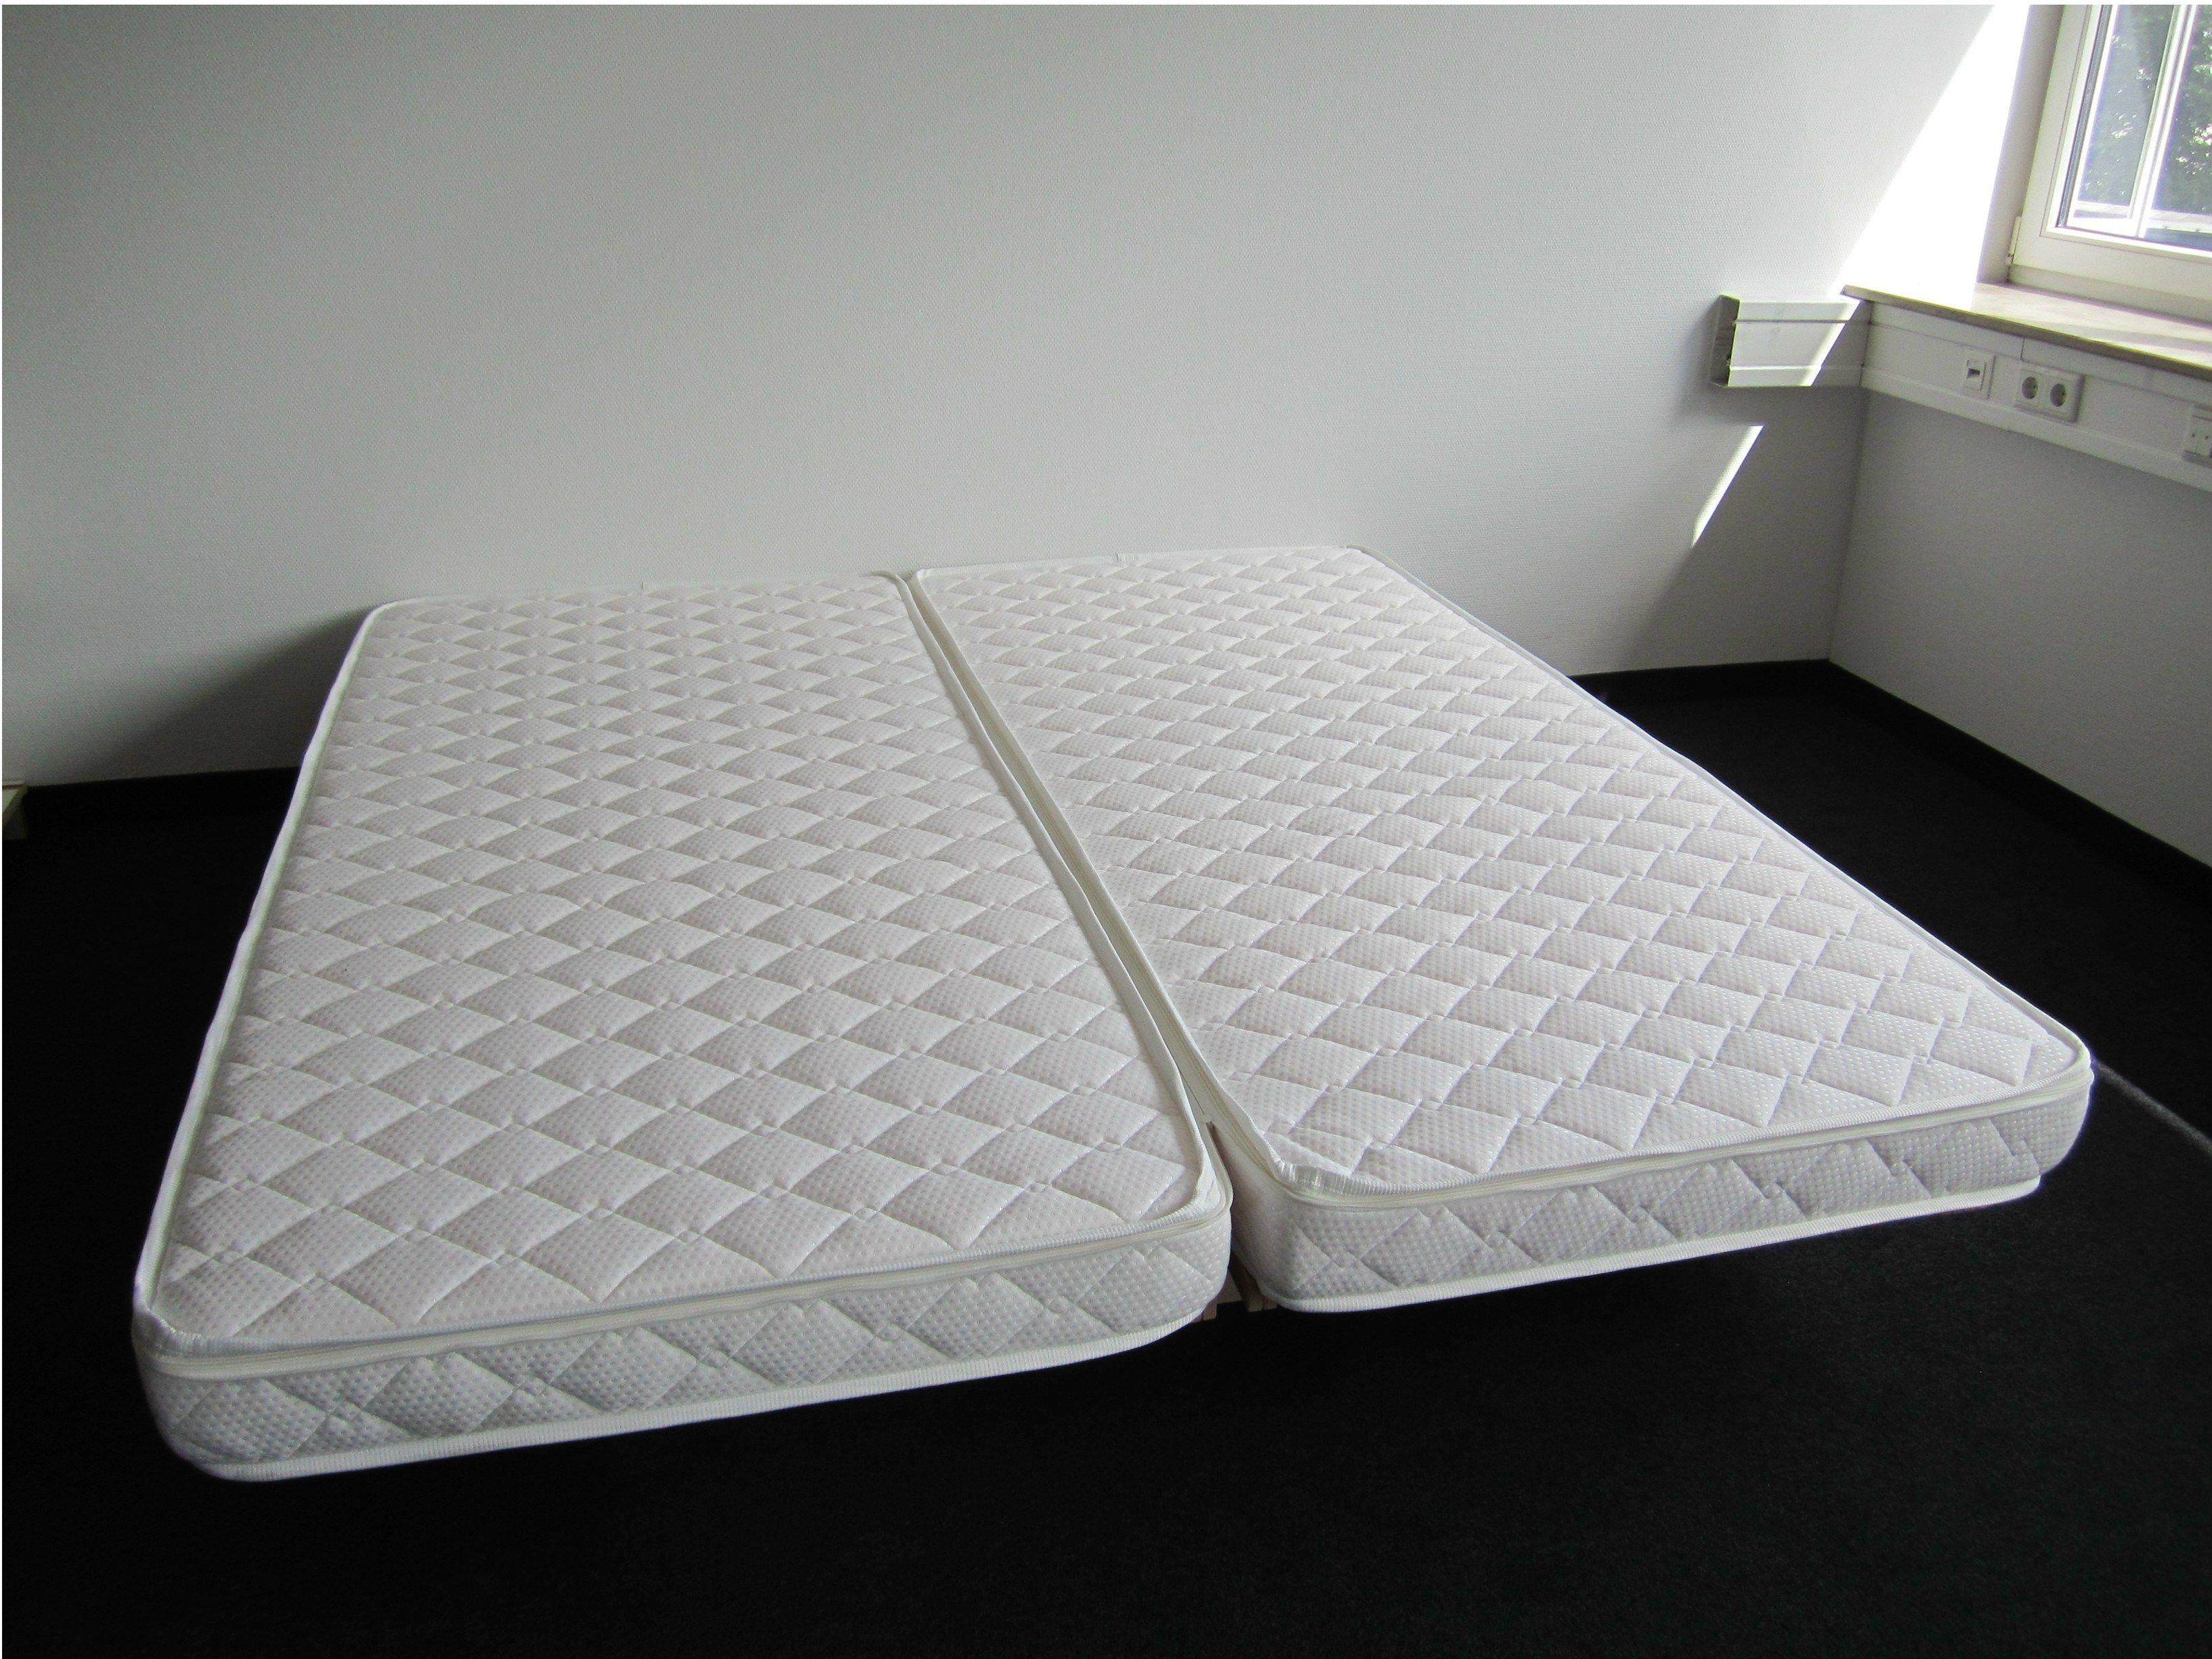 Pin by Ivan on Furniture Mattress, Memory foam mattress